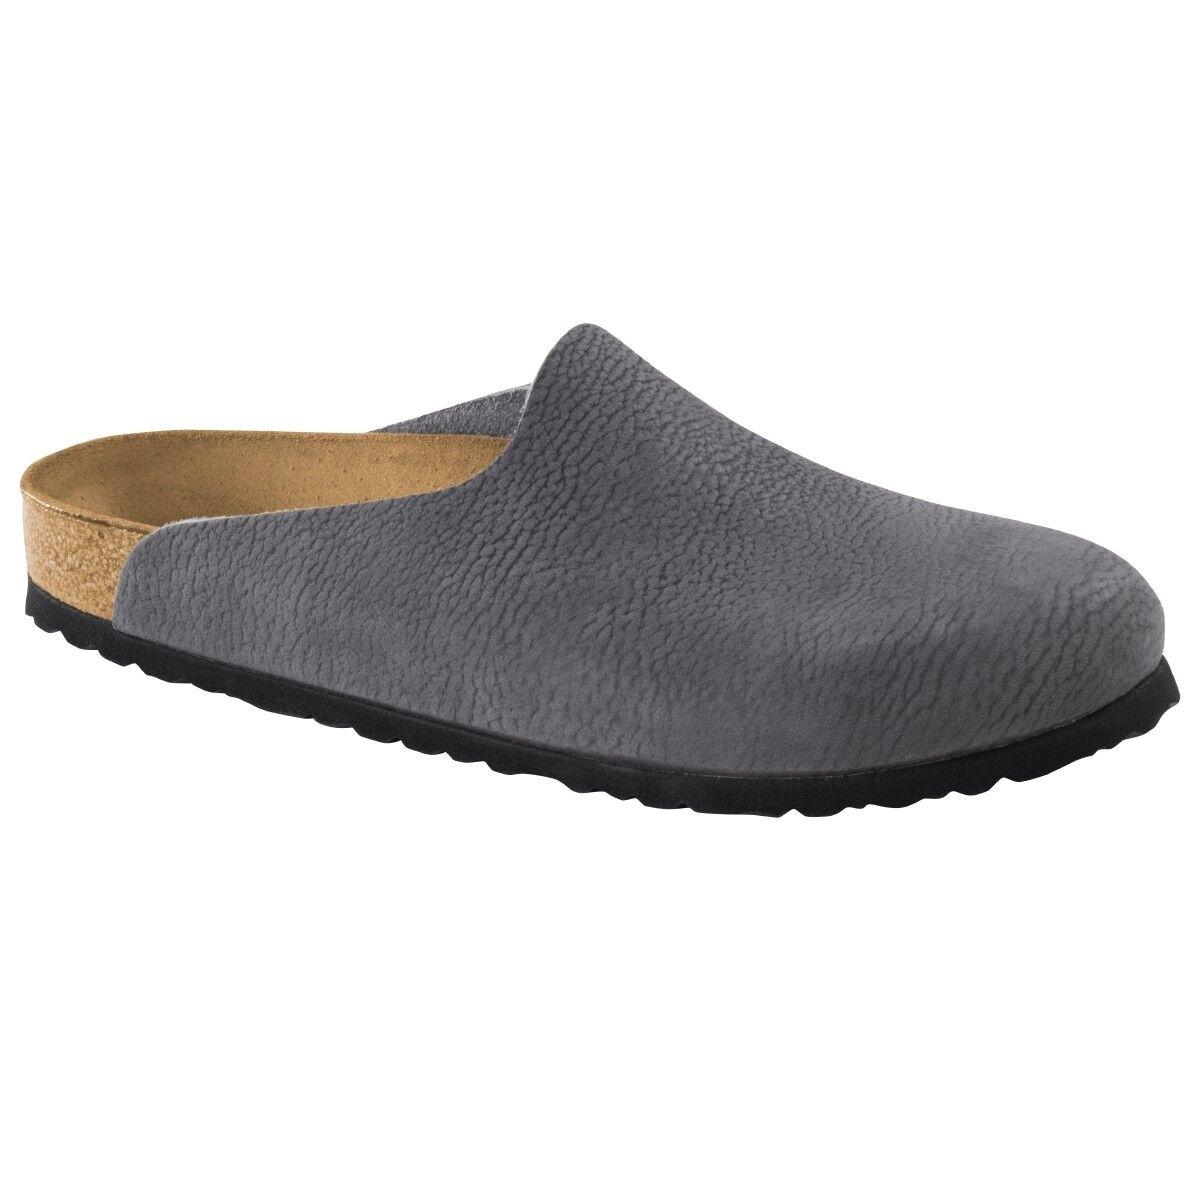 Birkenstock Amsterdam Nubukleder Clogs 1006717 Schuhe Pantolette Weite normal 1006717 Clogs 37d3d3